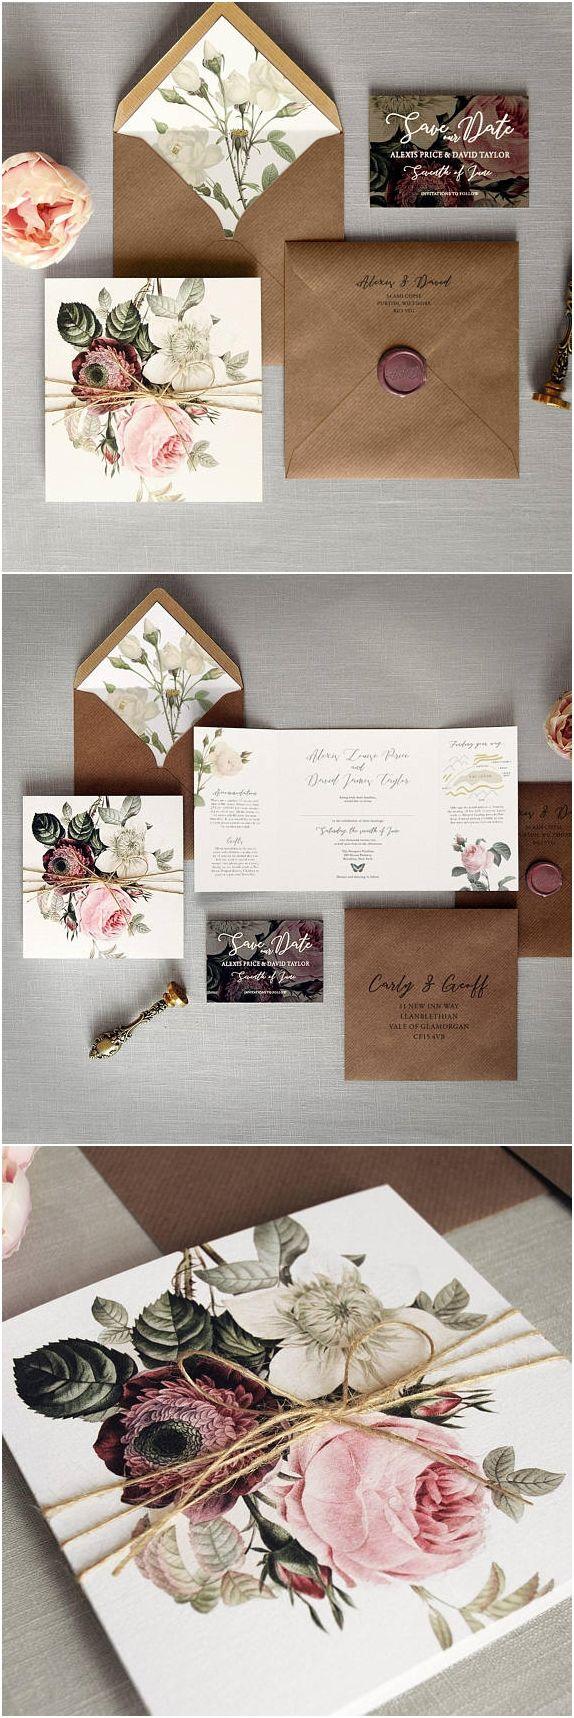 wedding invitation quote in english%0A English Garden  Luxury Folding Wedding Invitations  u     Save the Date  Rustic  twine  woodland